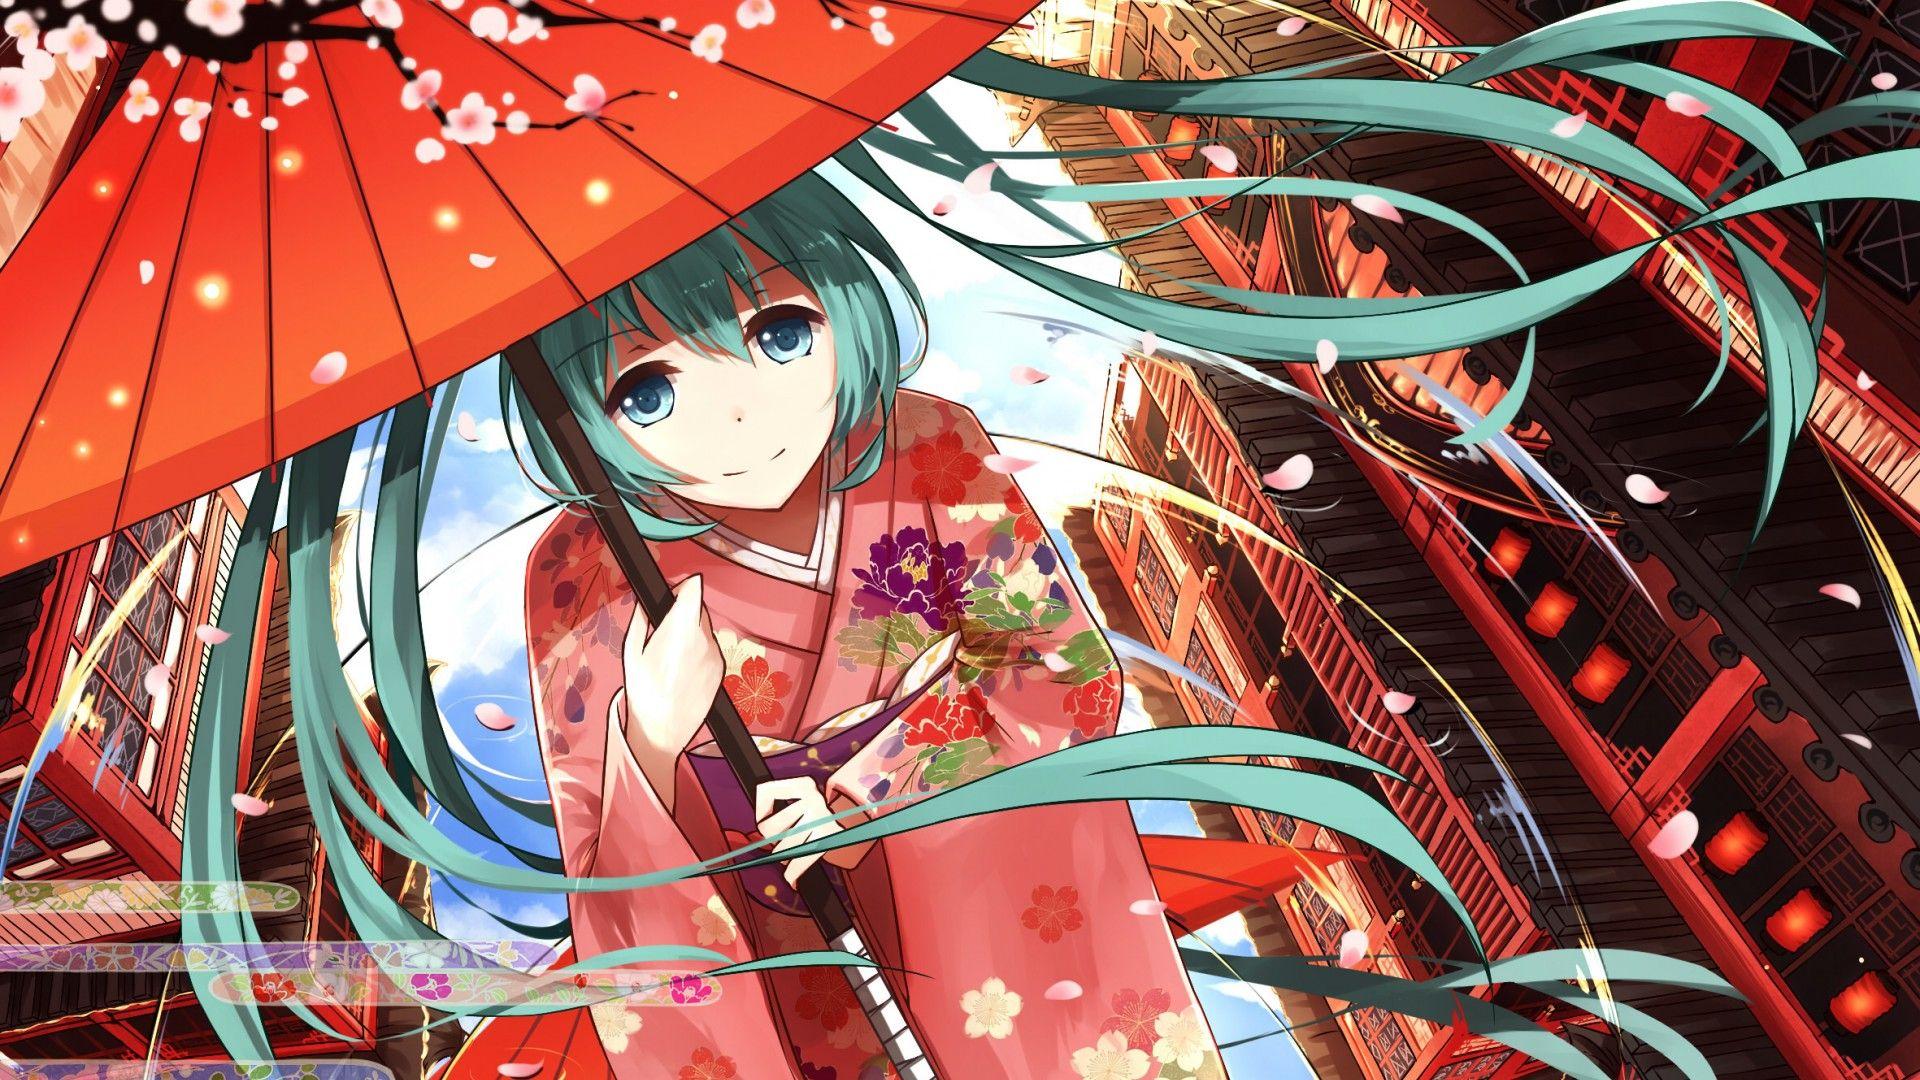 Download Wallpaper Art Levi9452 Vocaloid Hatsune Miku Girl Sakura Petals Umbrella Anime Resolution 1920x1080 Hatsune Miku Anime Wallpaper Hatsune